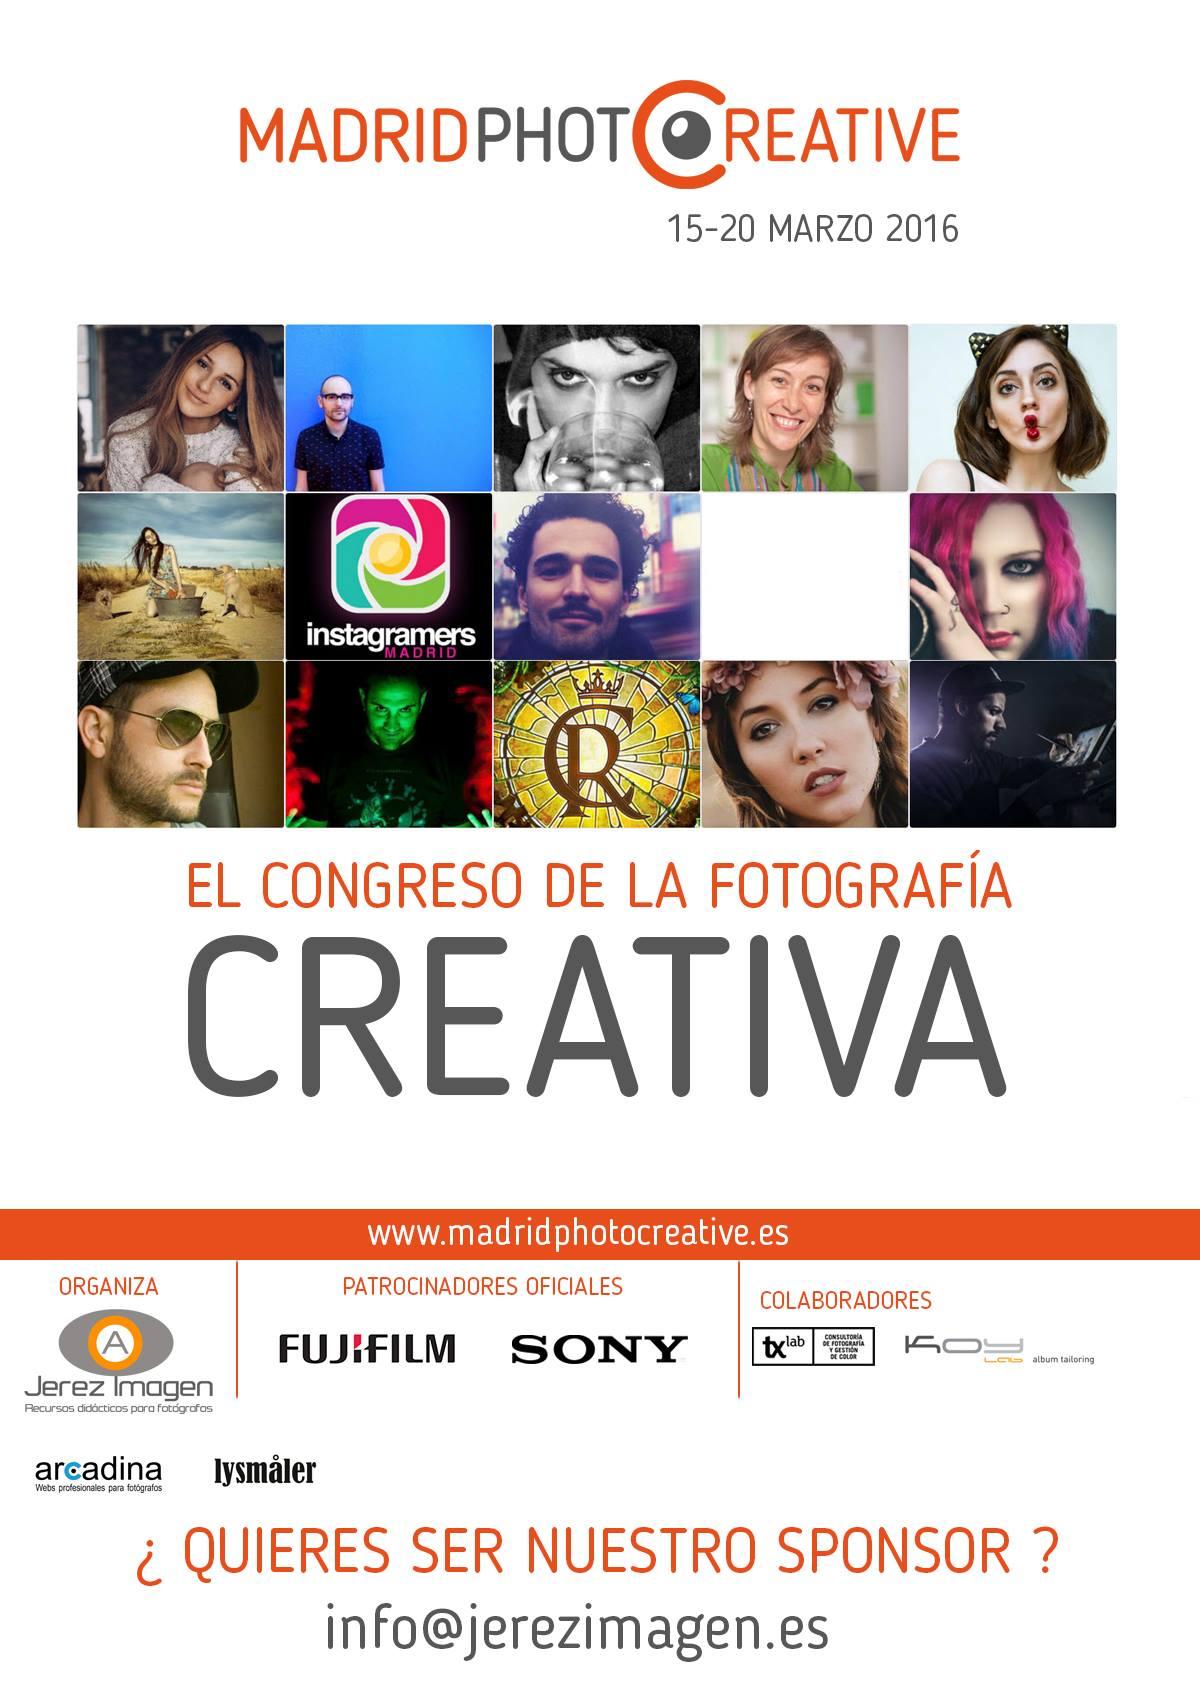 Madrid Photocreative